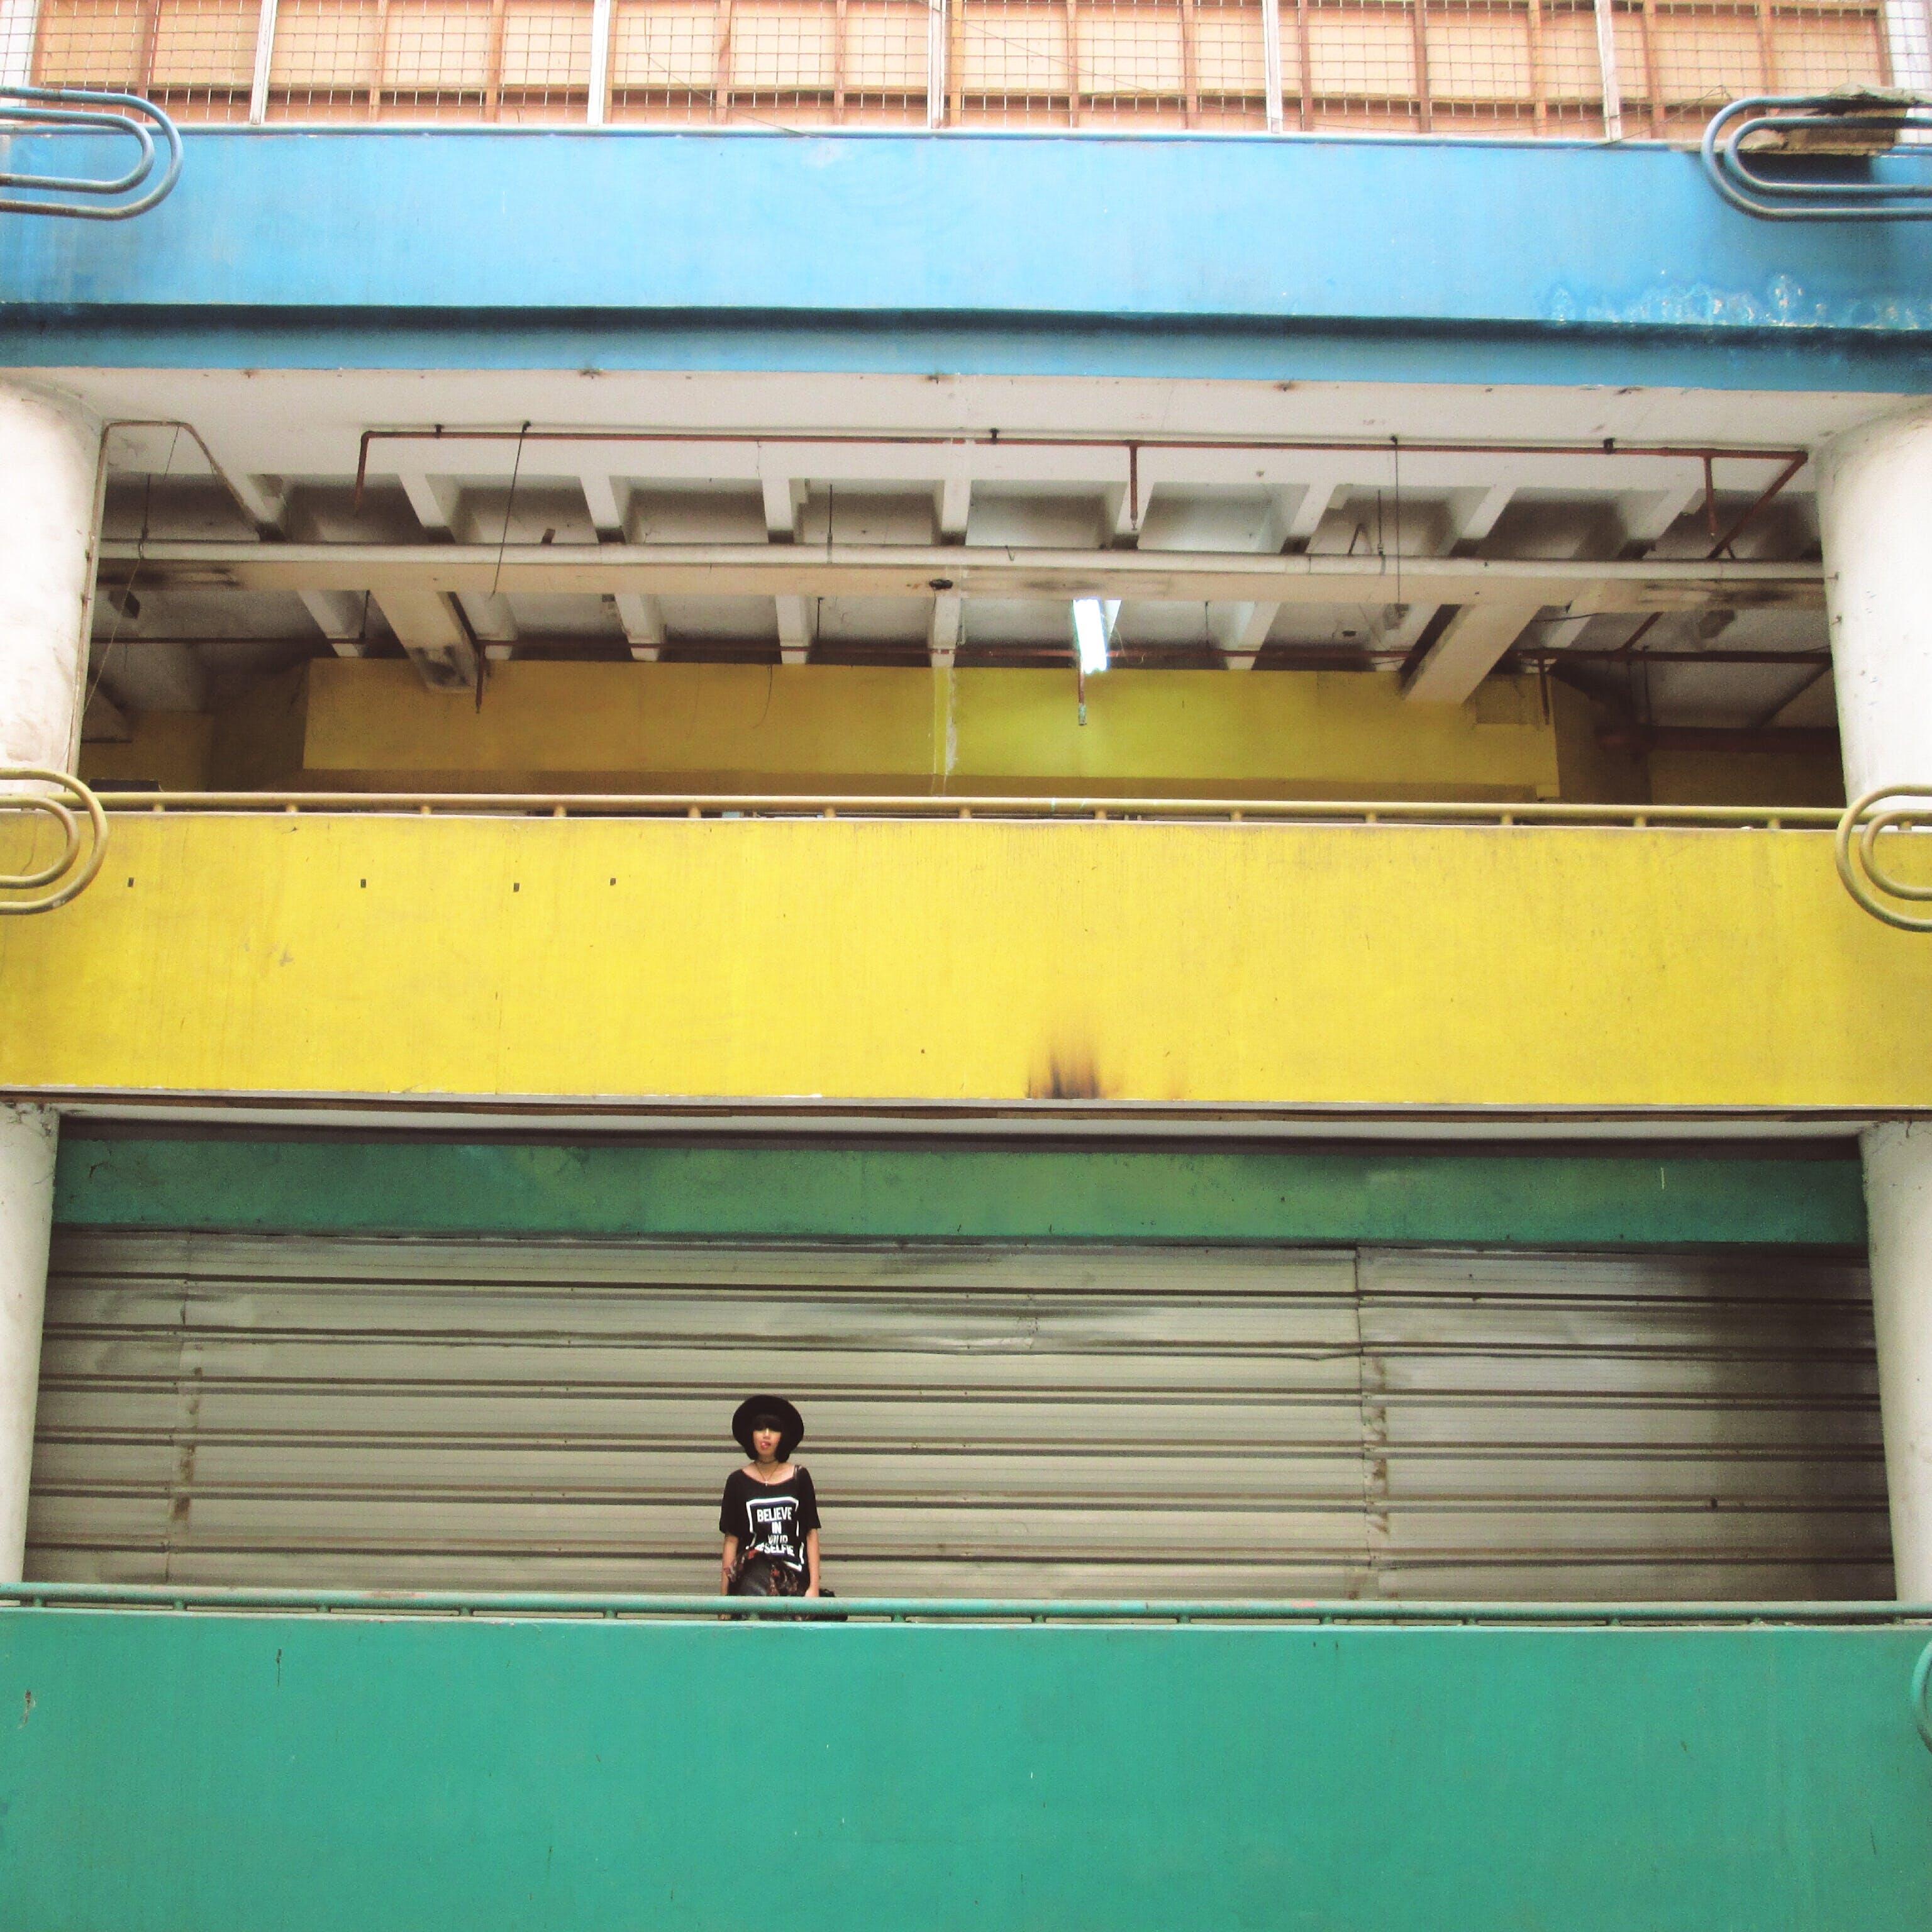 Woman Standing Inside Building